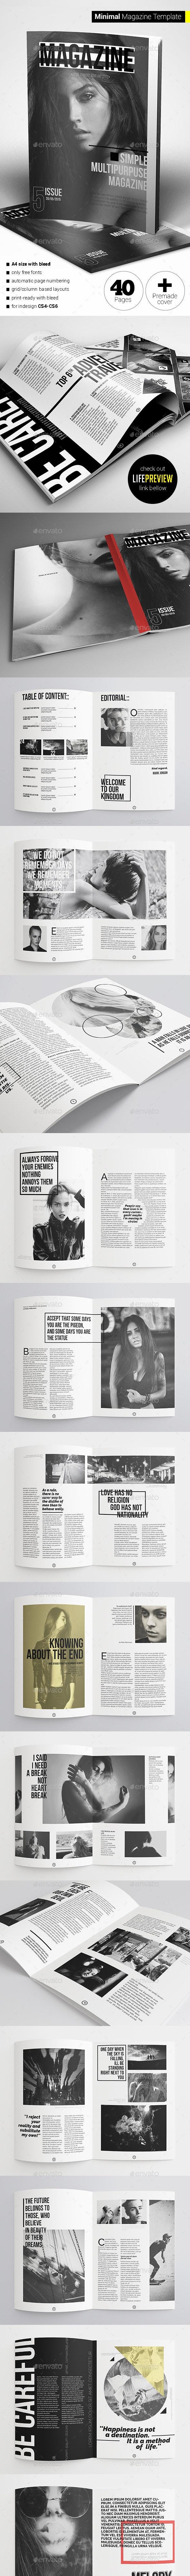 40 Pages Minimal Magazine - Magazines Print Templates